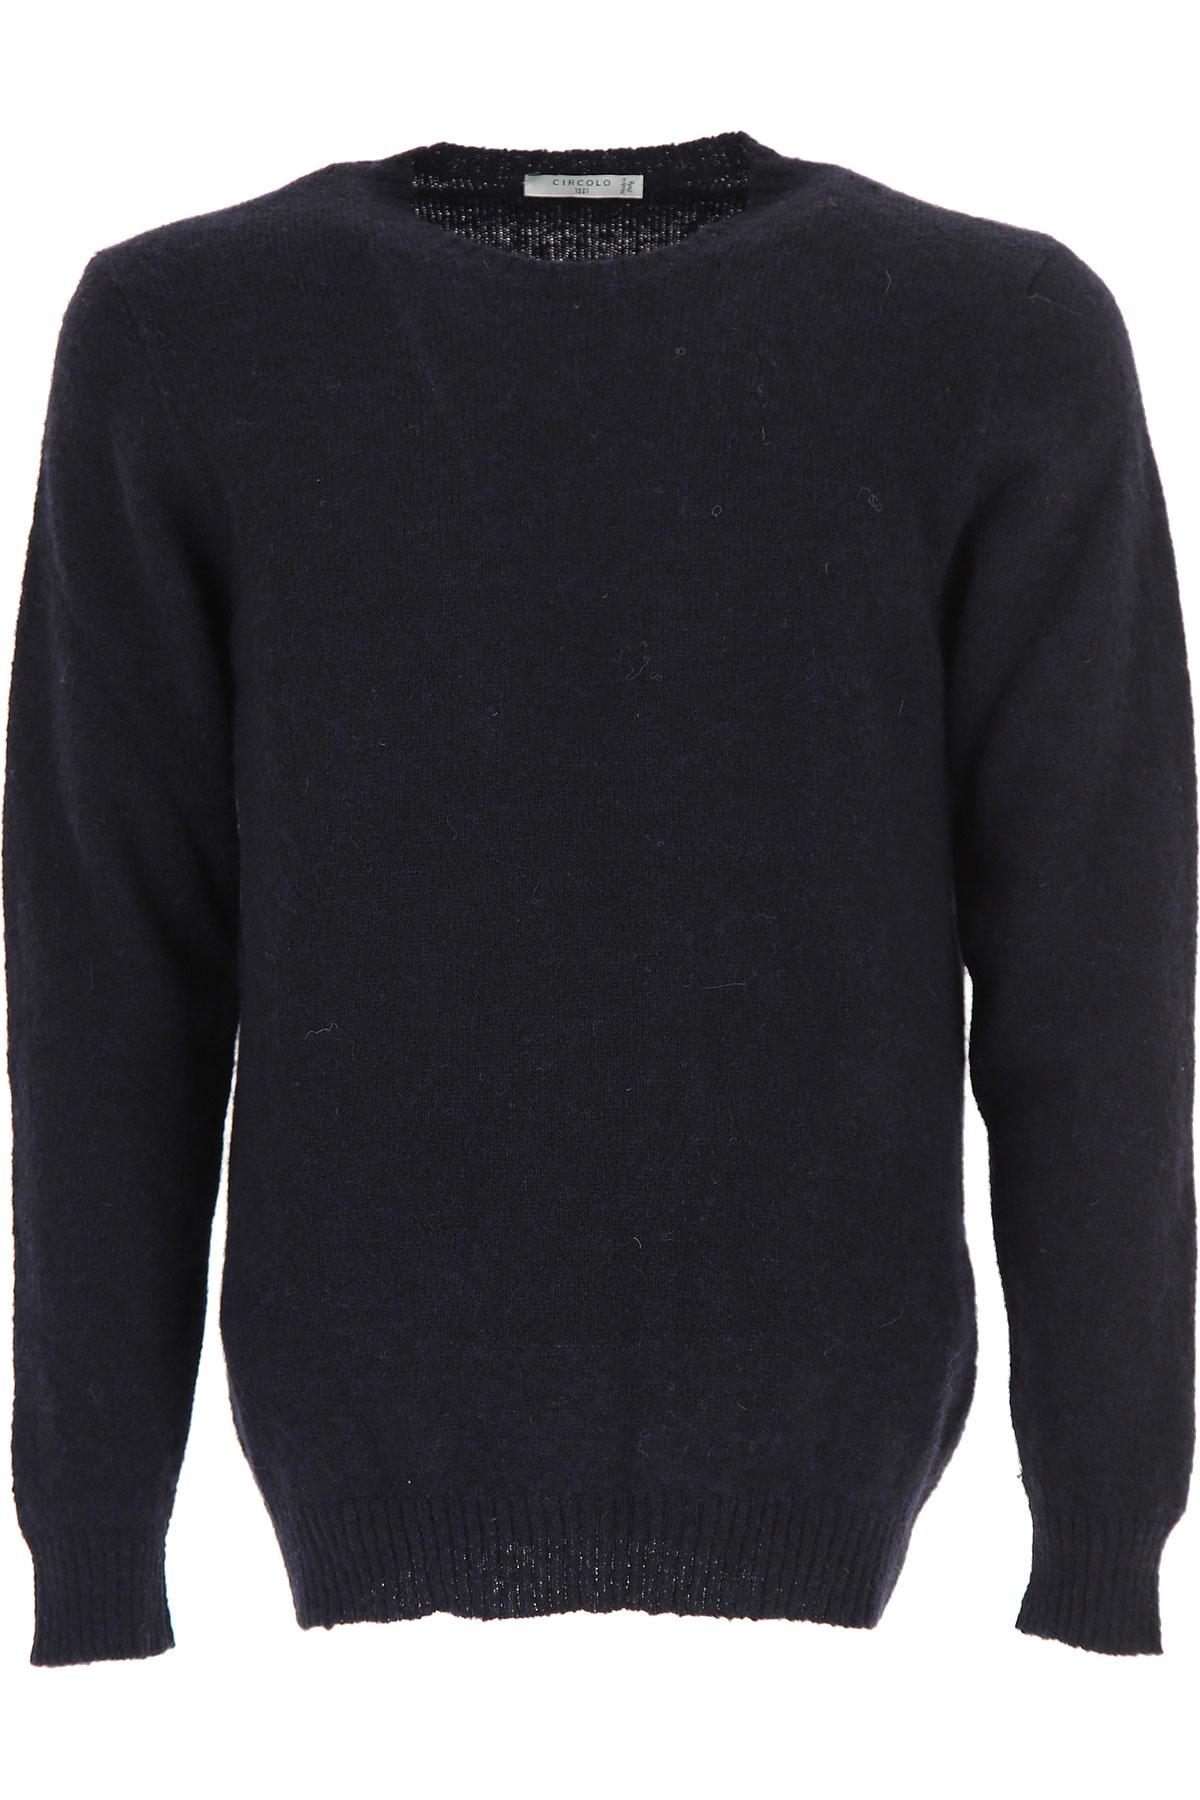 Circolo Sweater for Men Jumper, Night Blue, Camel, 2019, 32 34